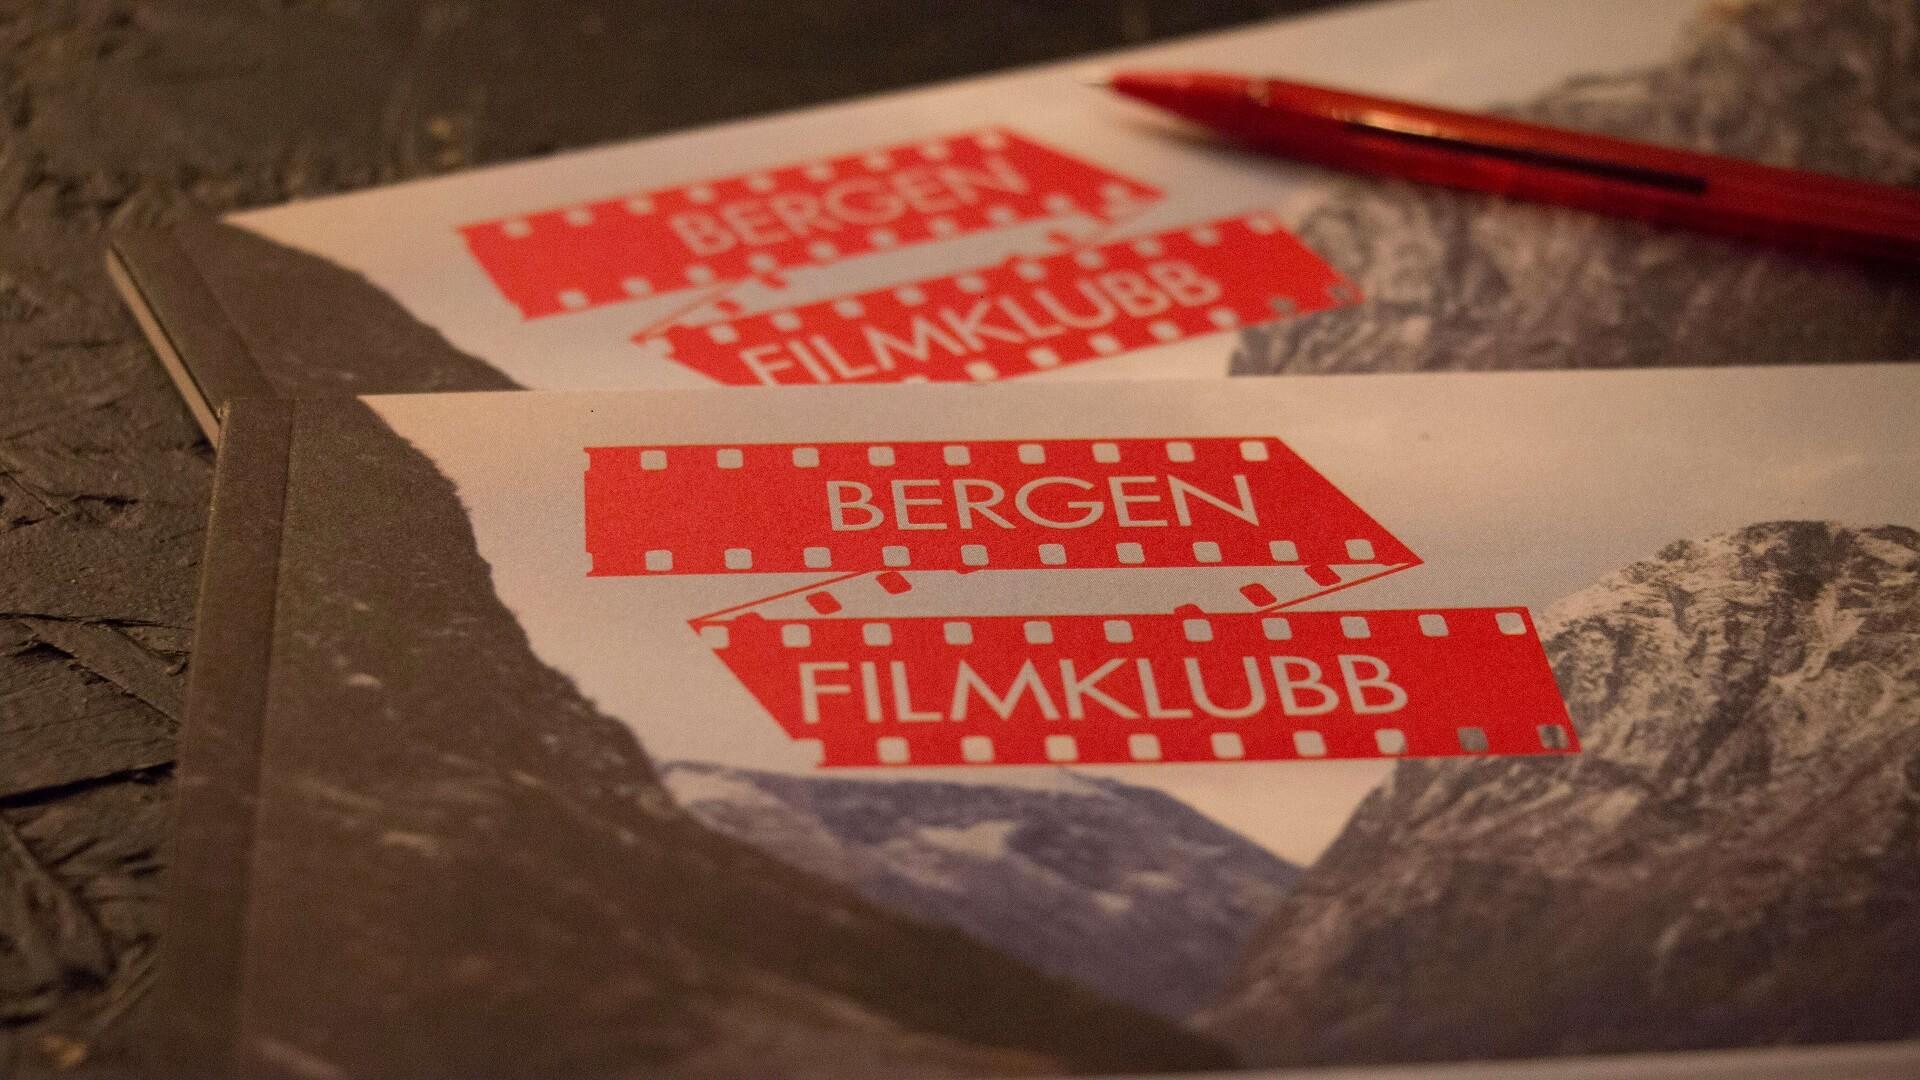 bergen filmklubb 55